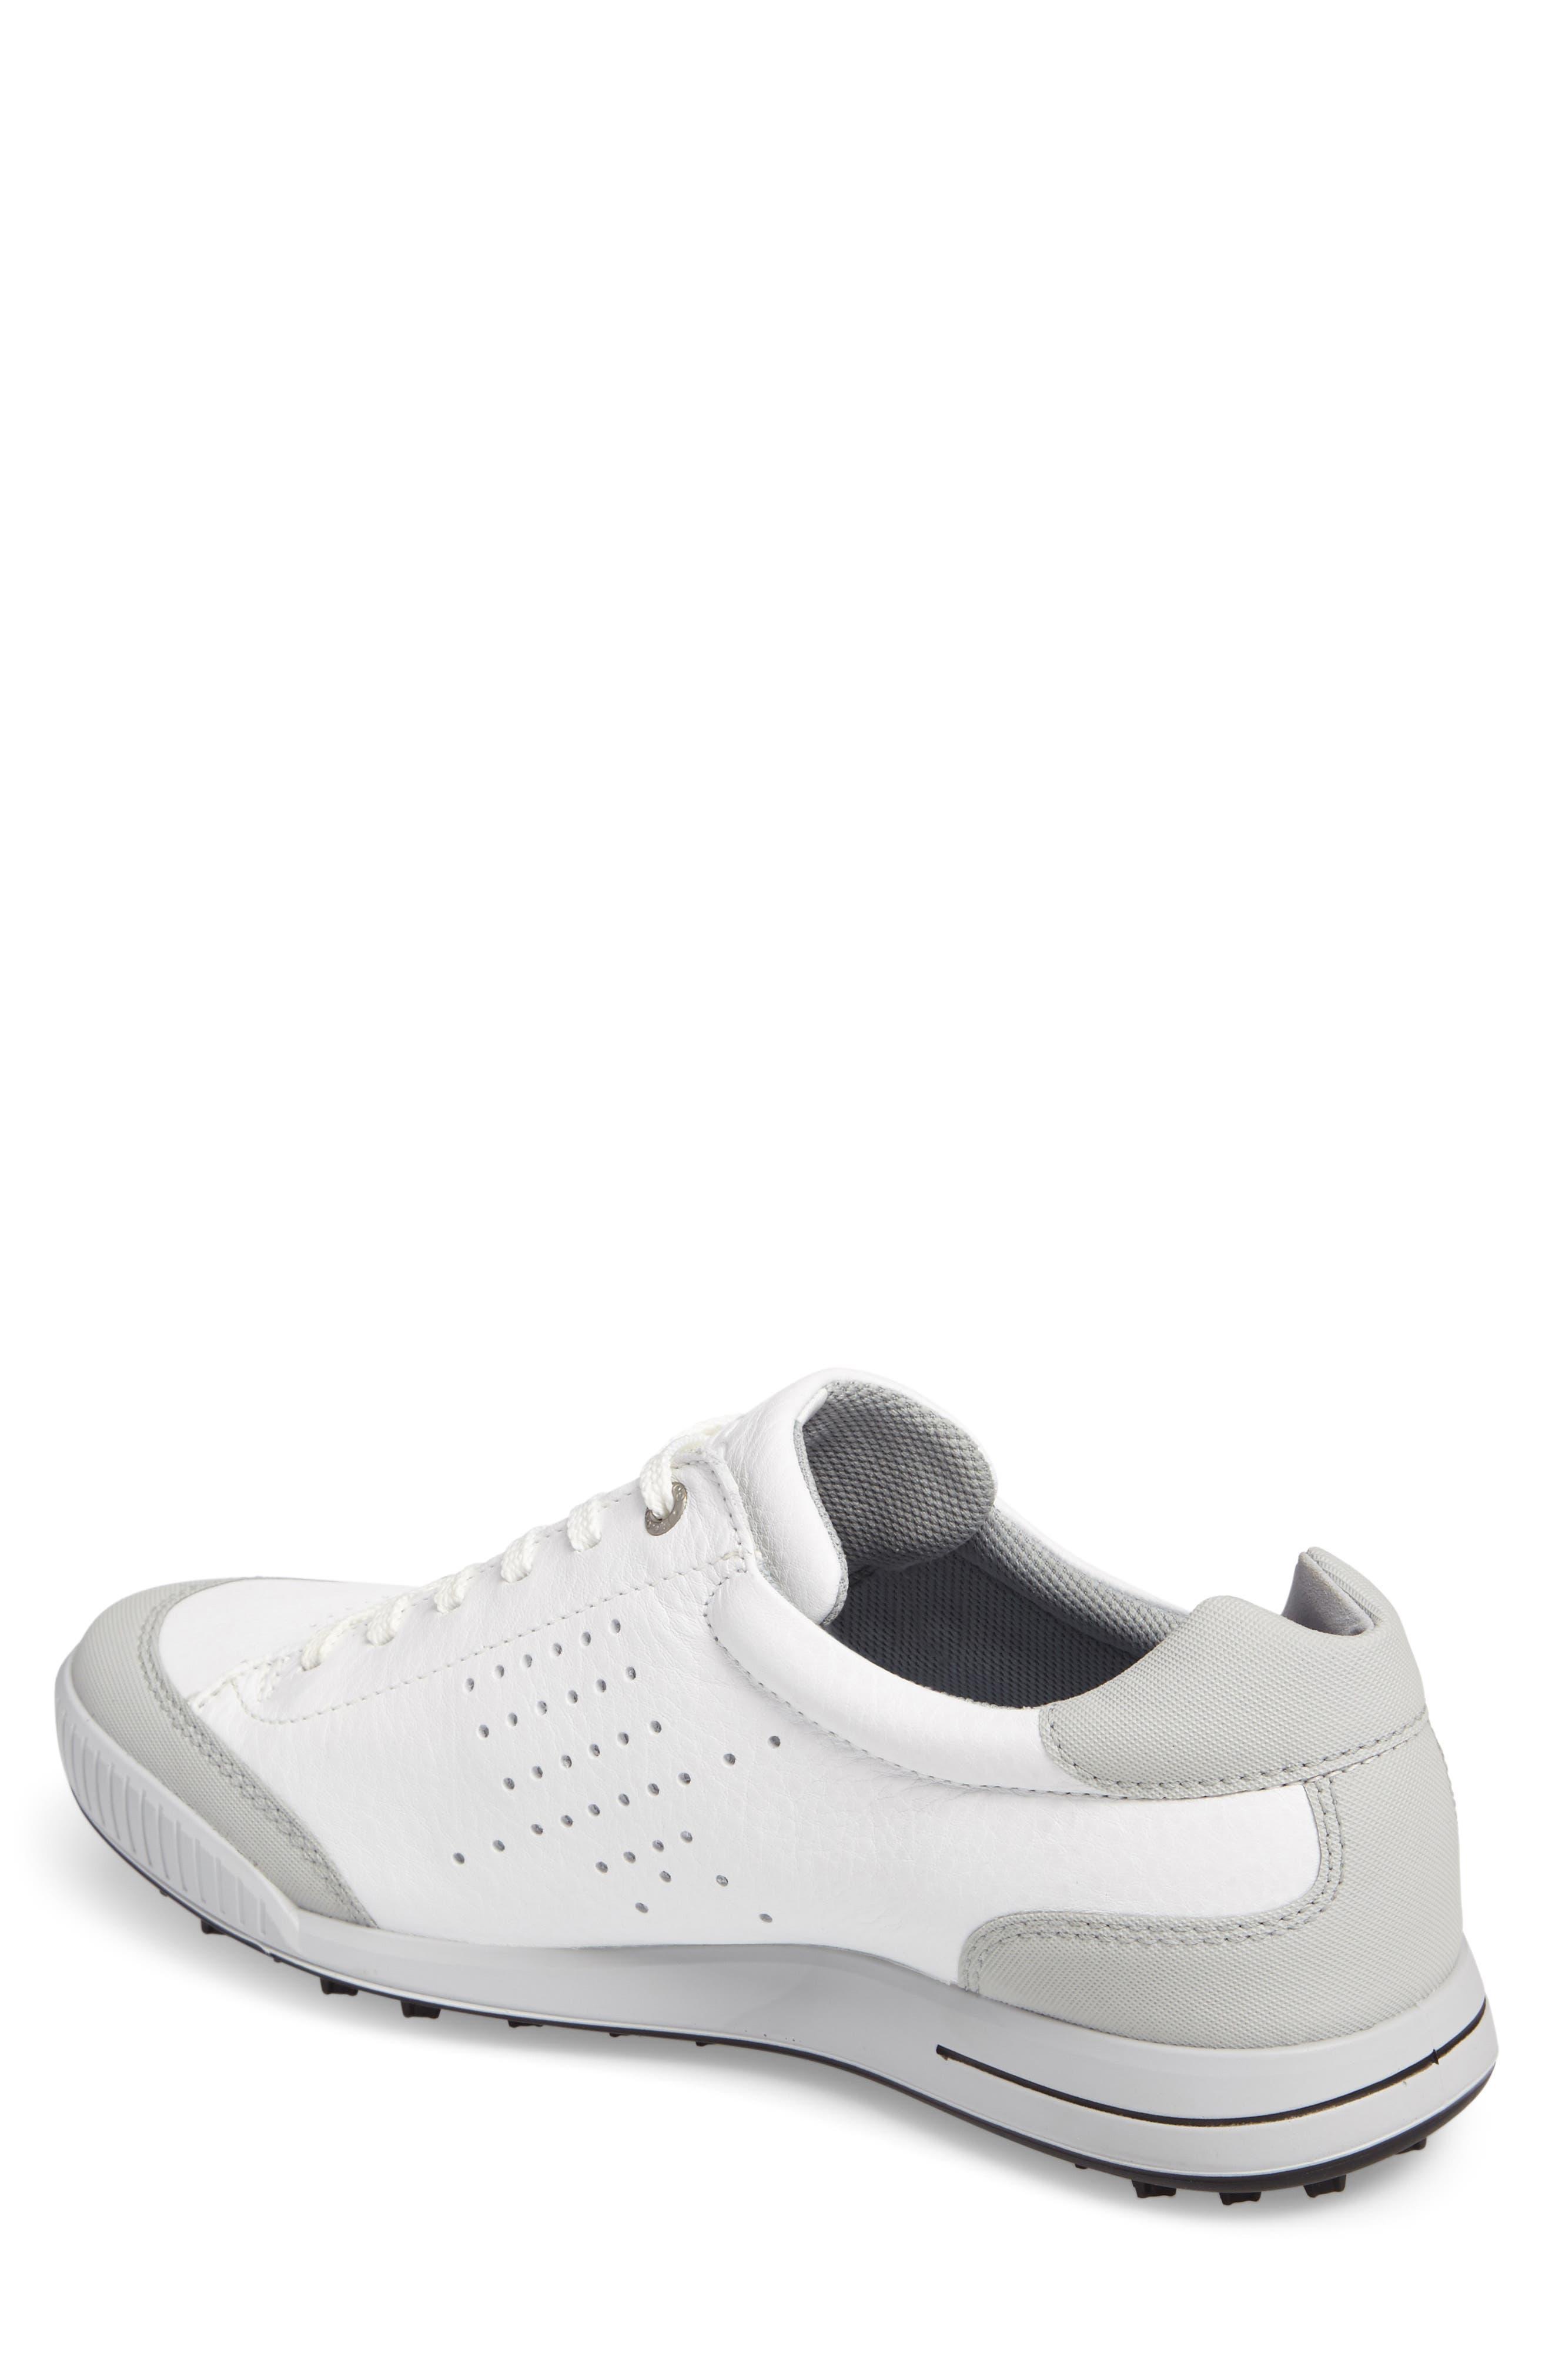 ECCO,                             Street Retro HM Golf Shoe,                             Alternate thumbnail 2, color,                             WHITE/ CONCRETE